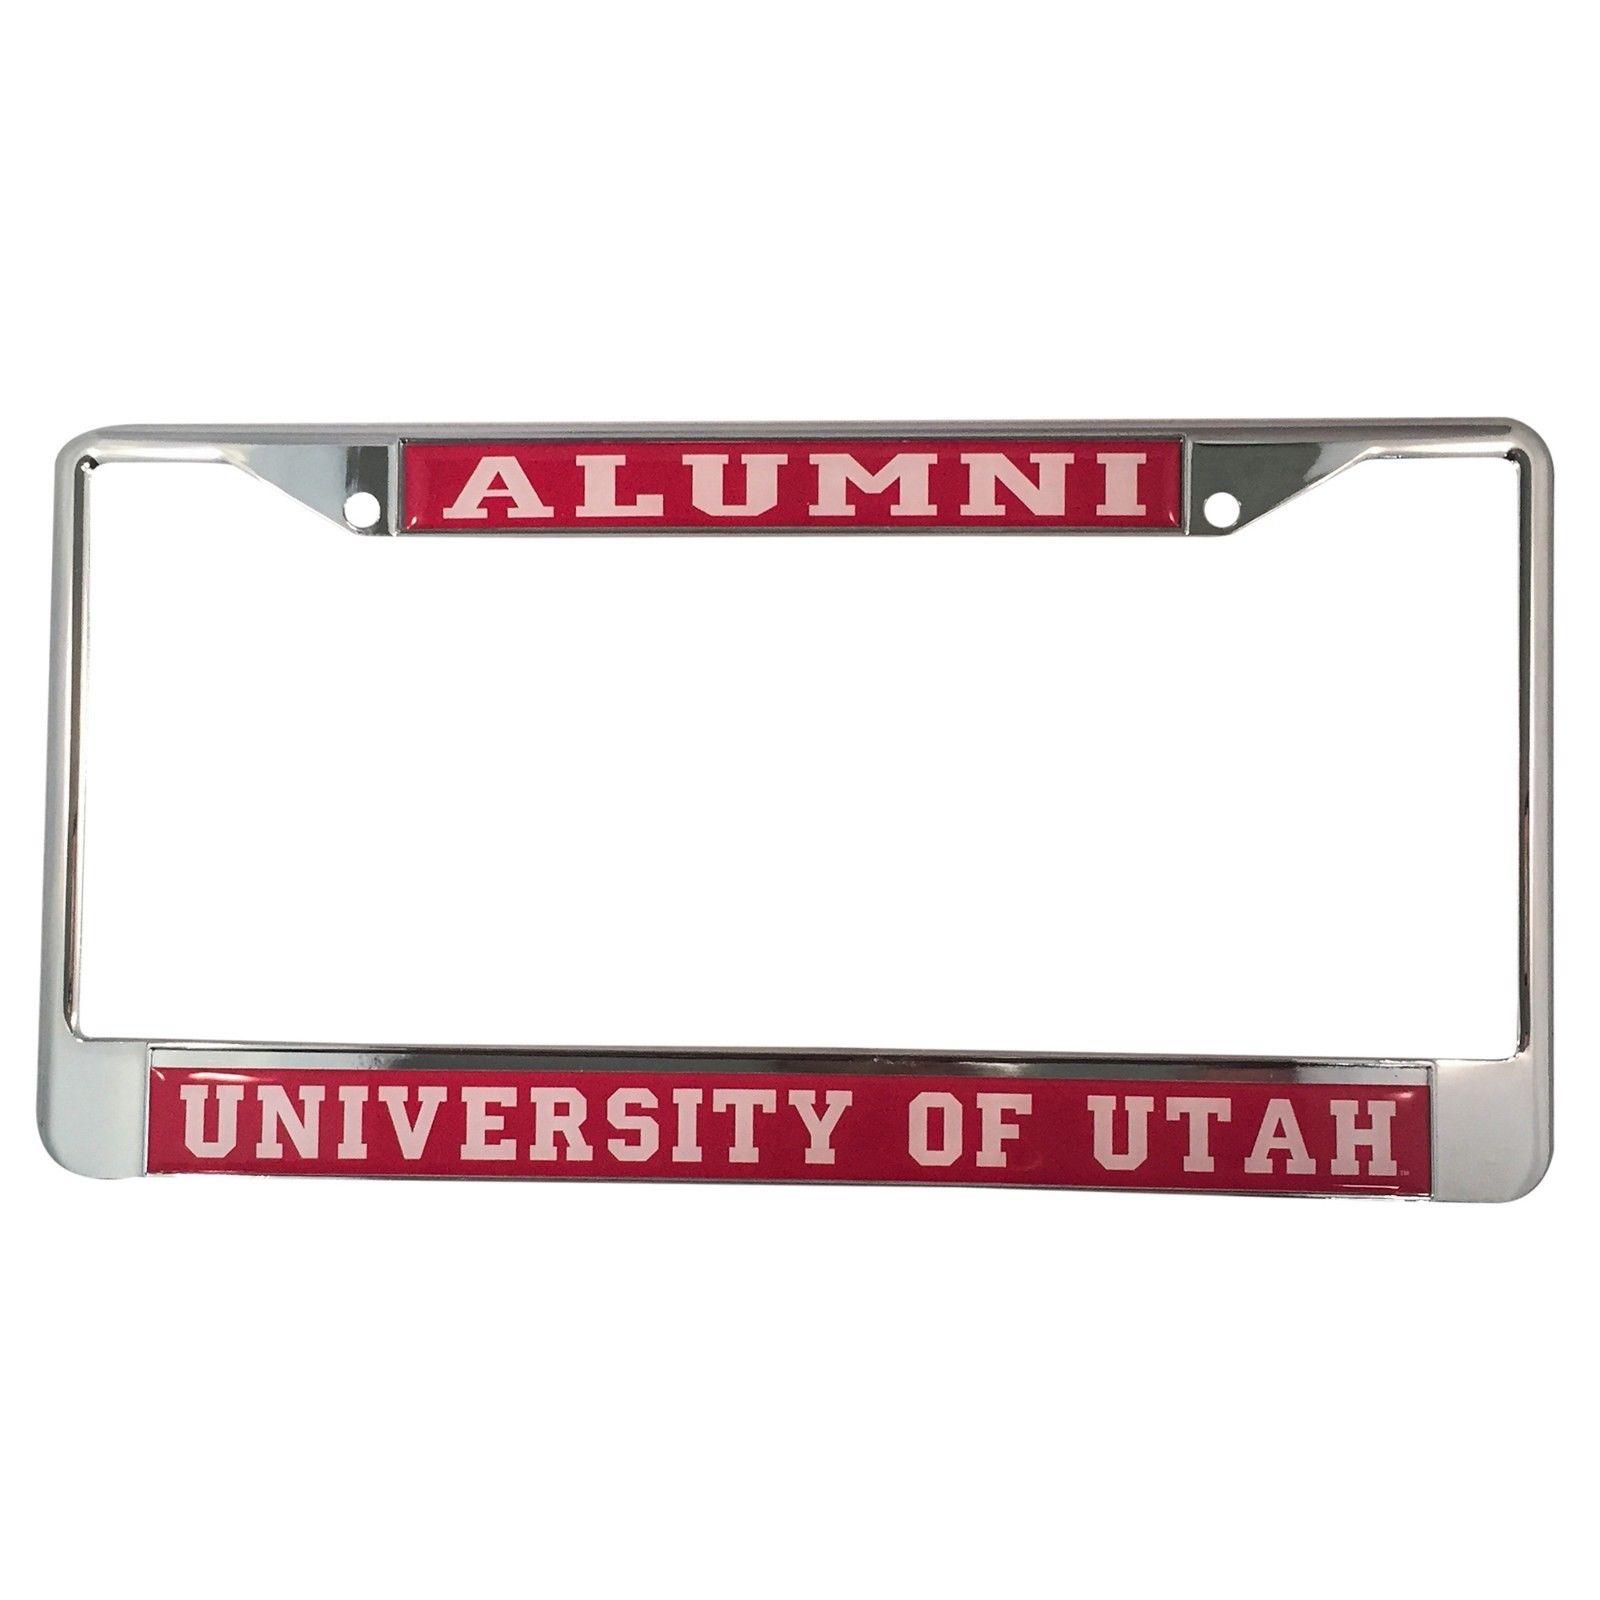 University of Utah Utes Alumni License Plate Frame - Walmart.com